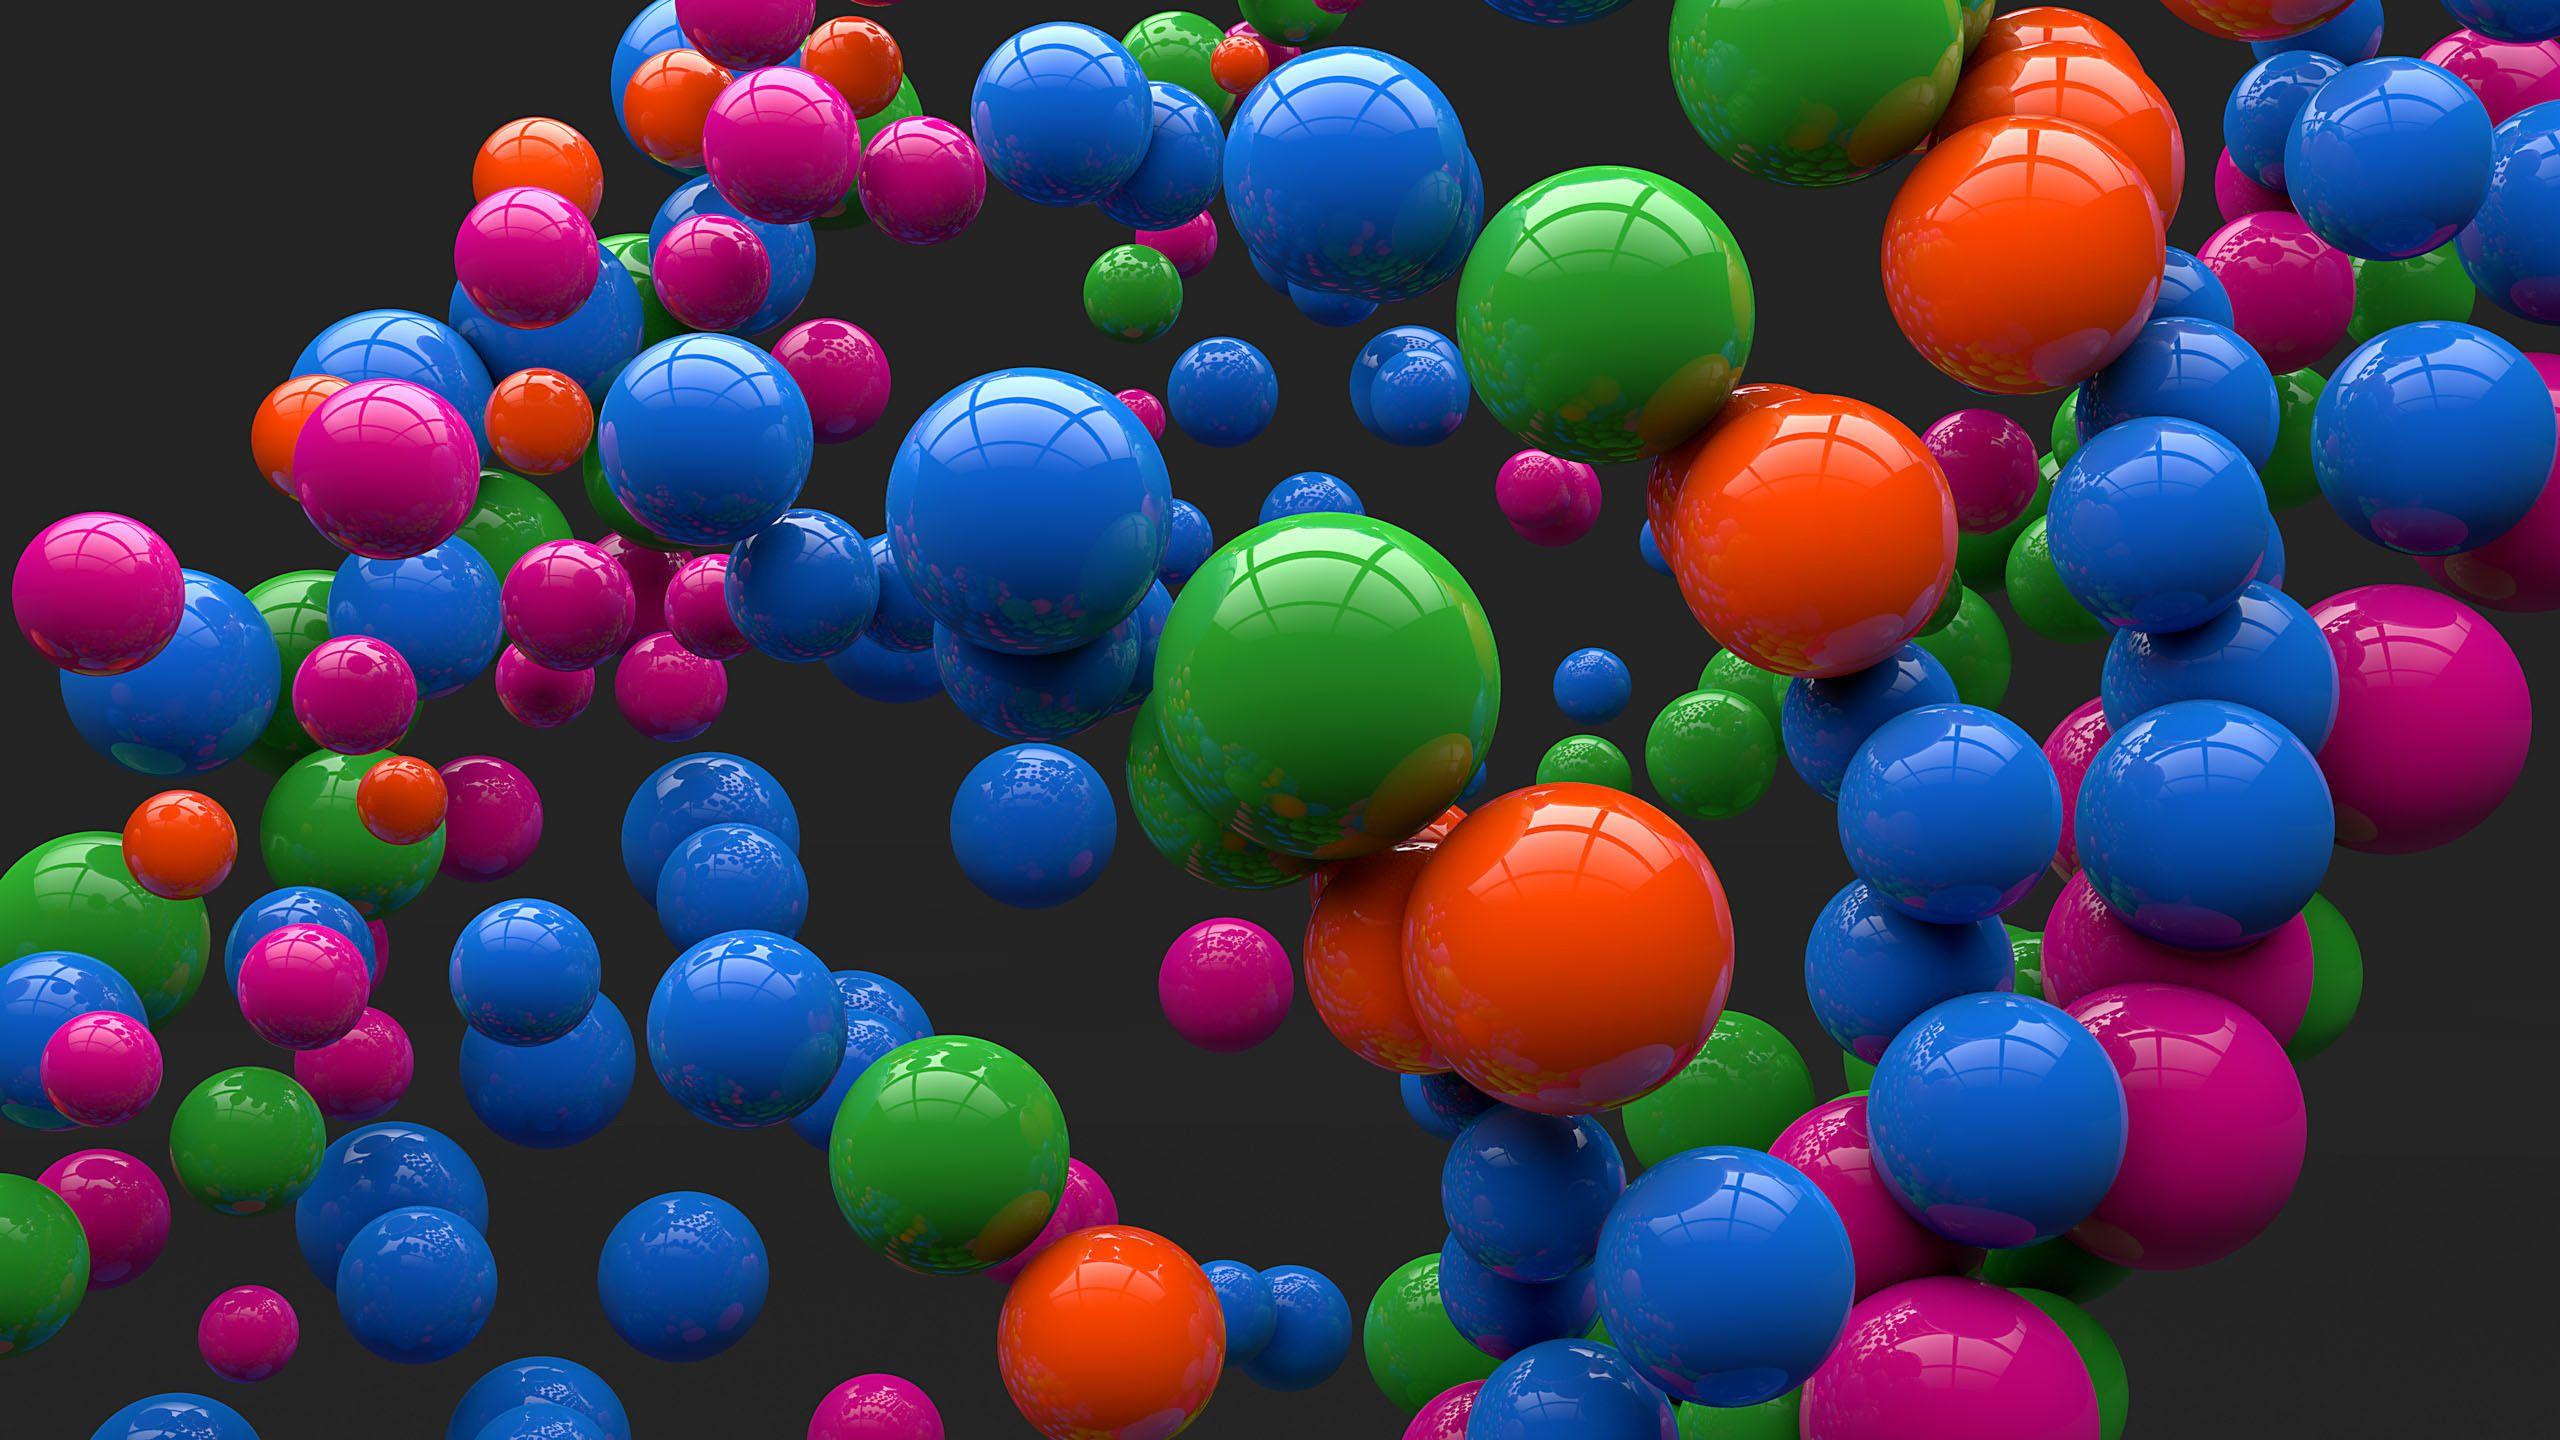 blue bubble wallpapers wallpaper | hd wallpapers | pinterest